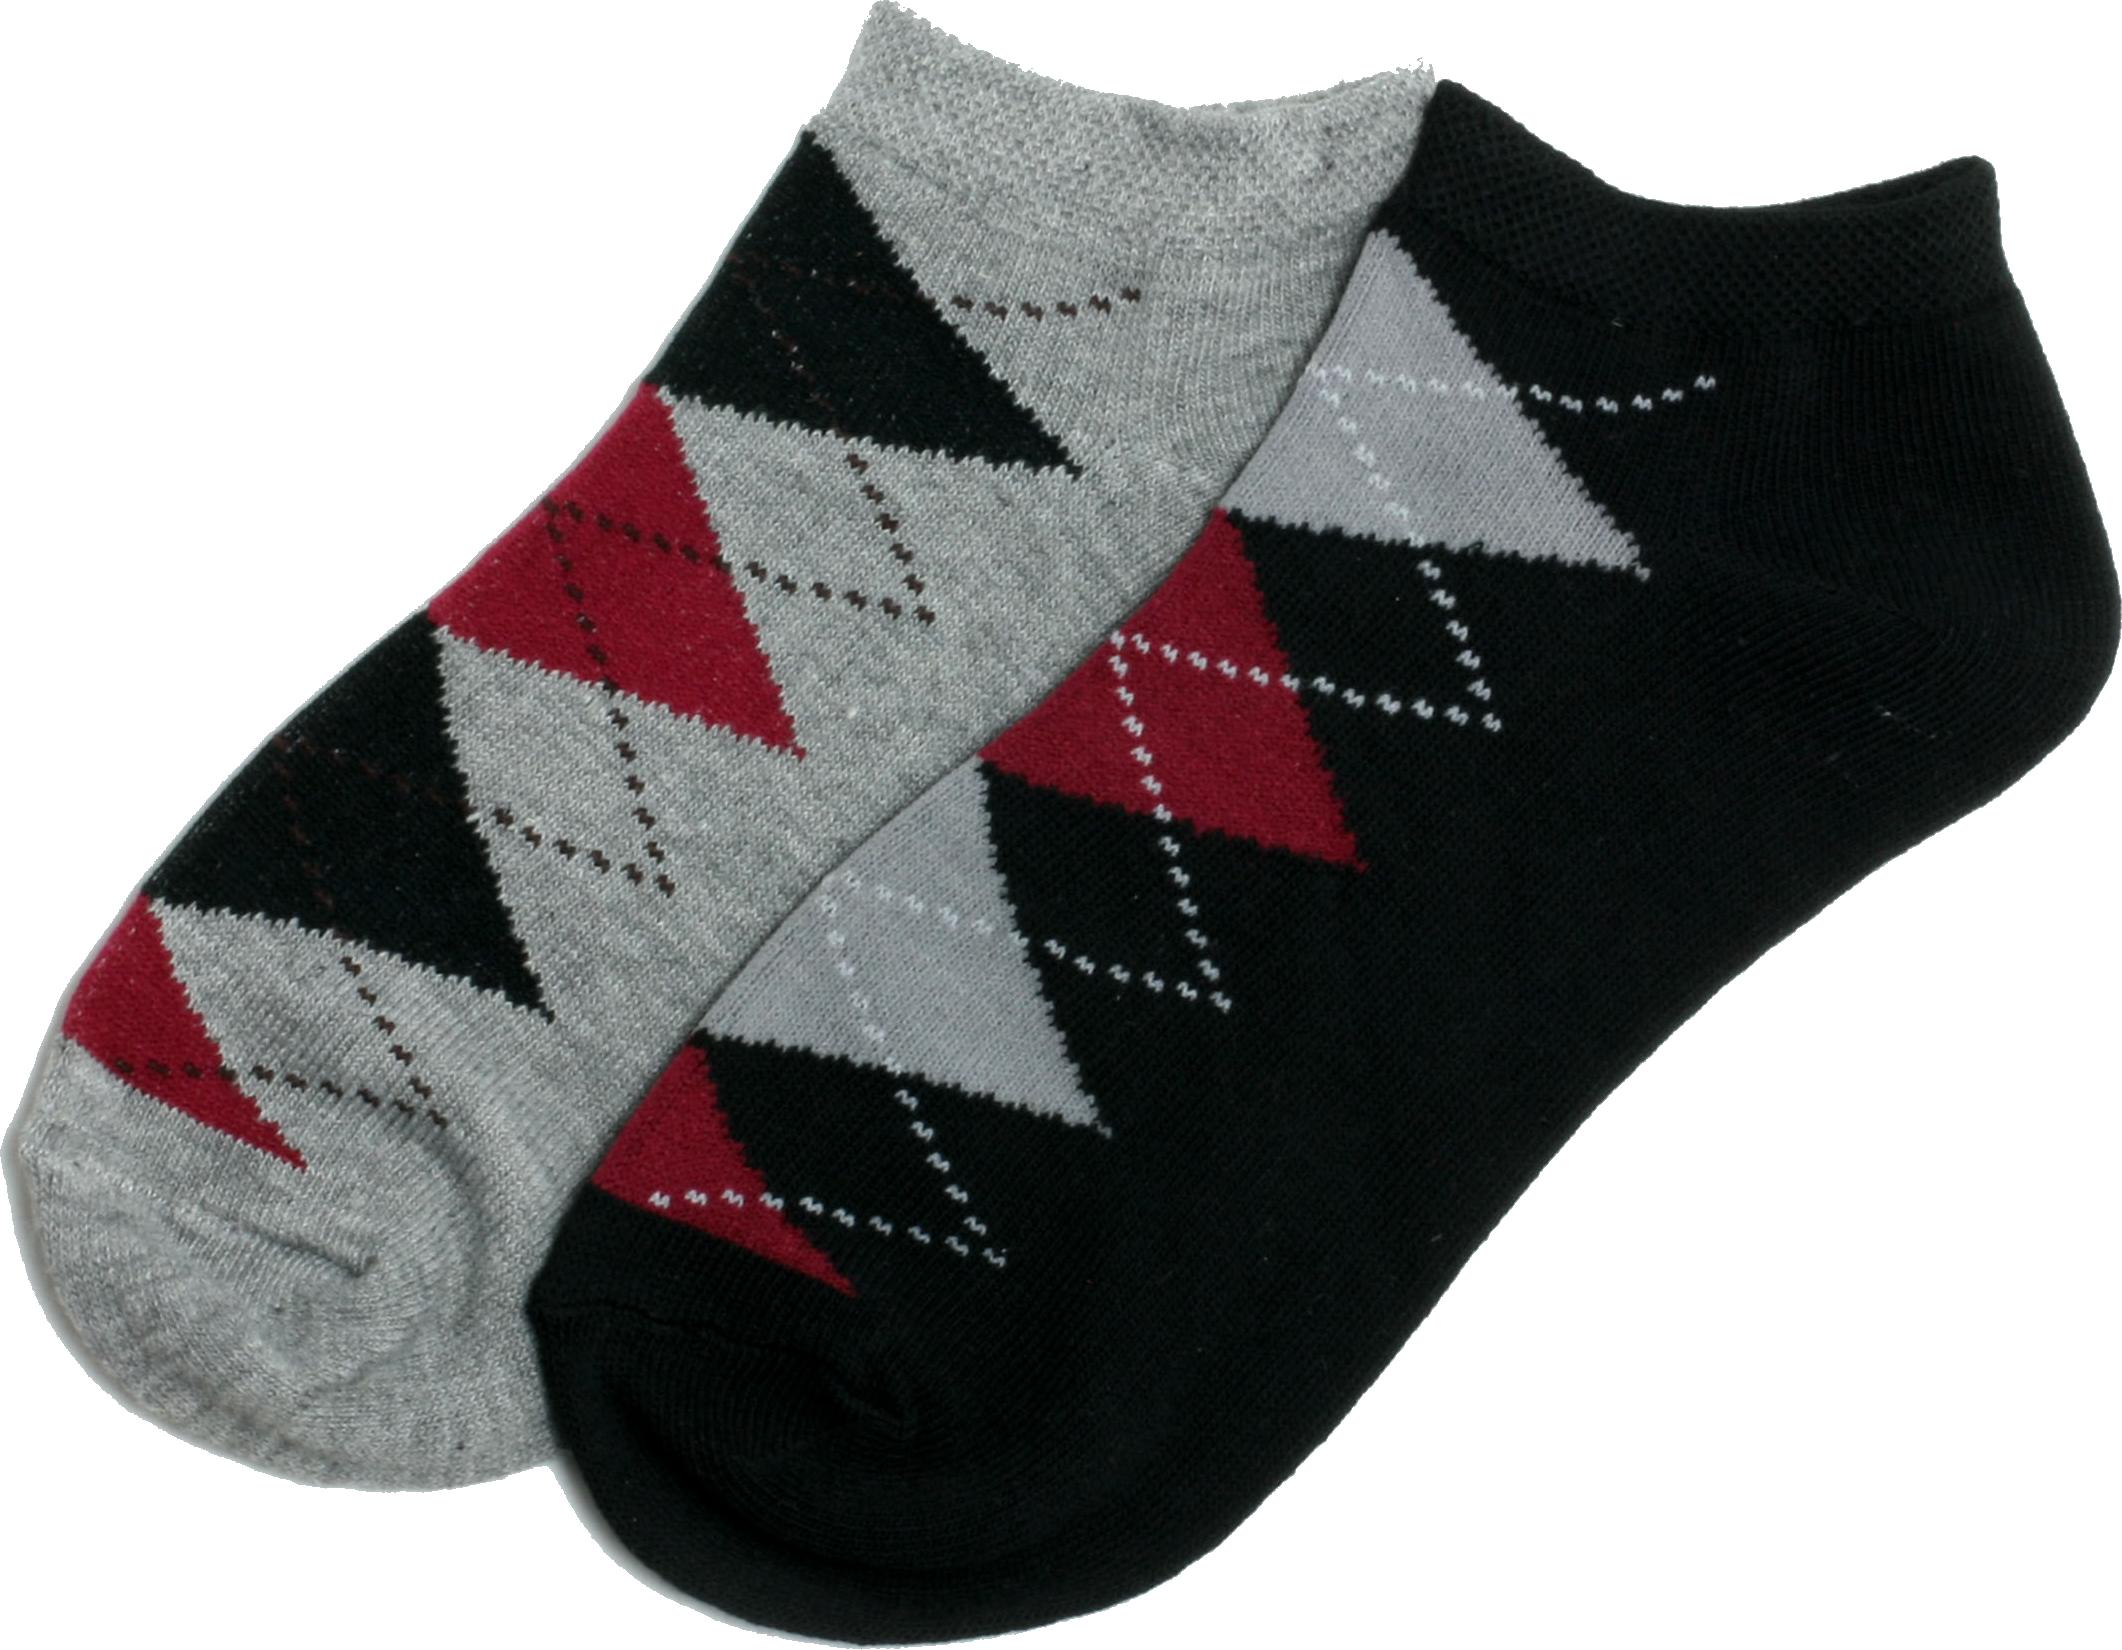 Socks PNG Image Blue socks, Black socks